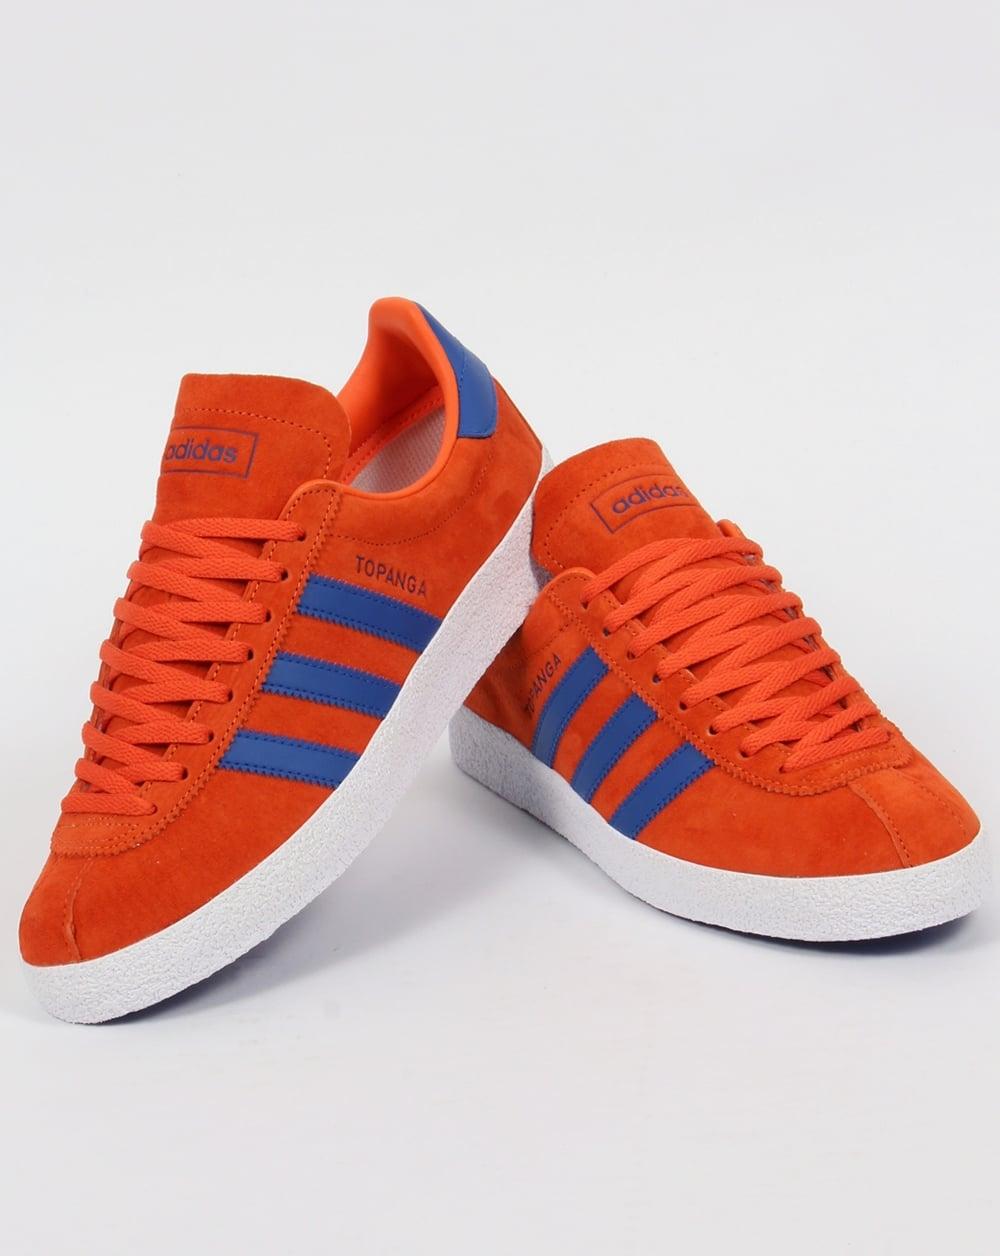 Adidas Topanga Trainers Craft Orange/Royal Blueoriginals ...